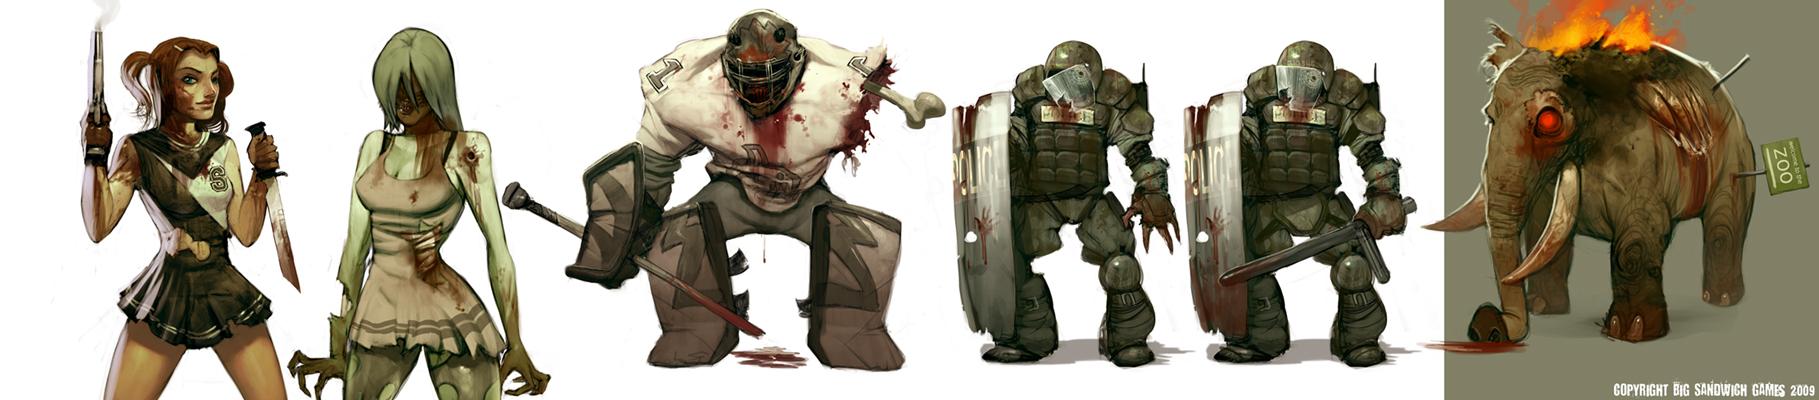 Work stuff - Zombies by jeffsimpsonkh